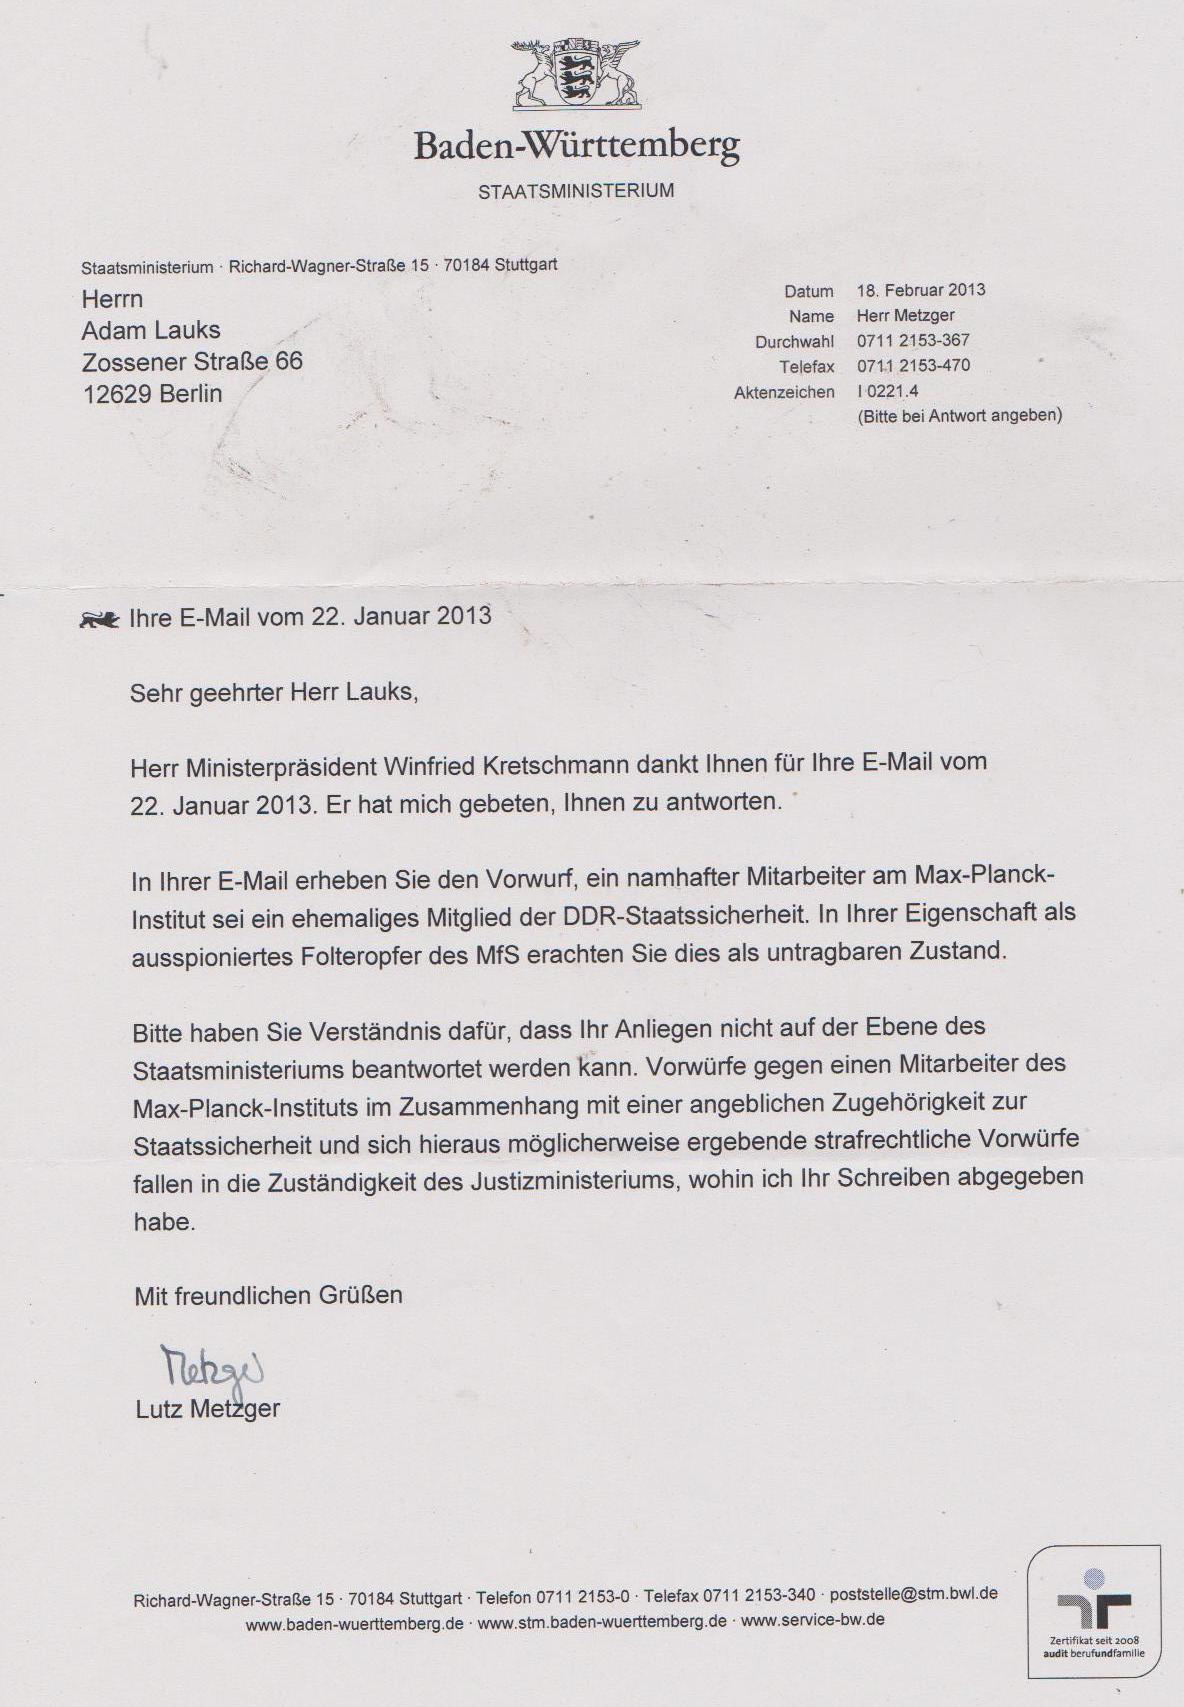 Offener Brief An Den Ministerpräsidenten Winnfried Kretshmann Im